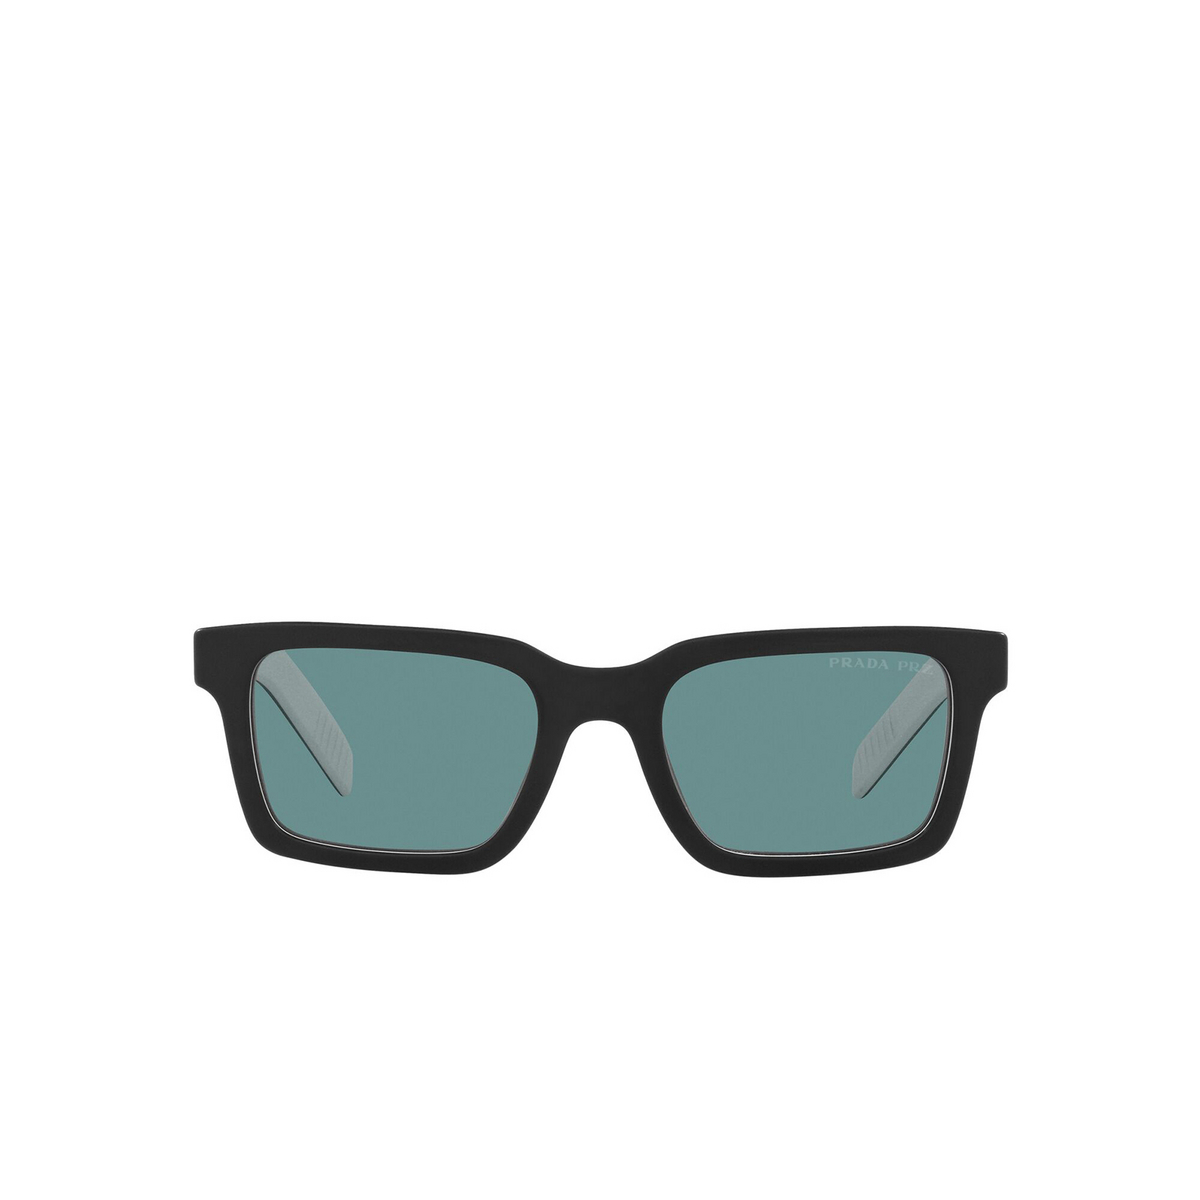 Prada® Rectangle Sunglasses: PR 06WS color Black White Black YC404D - front view.